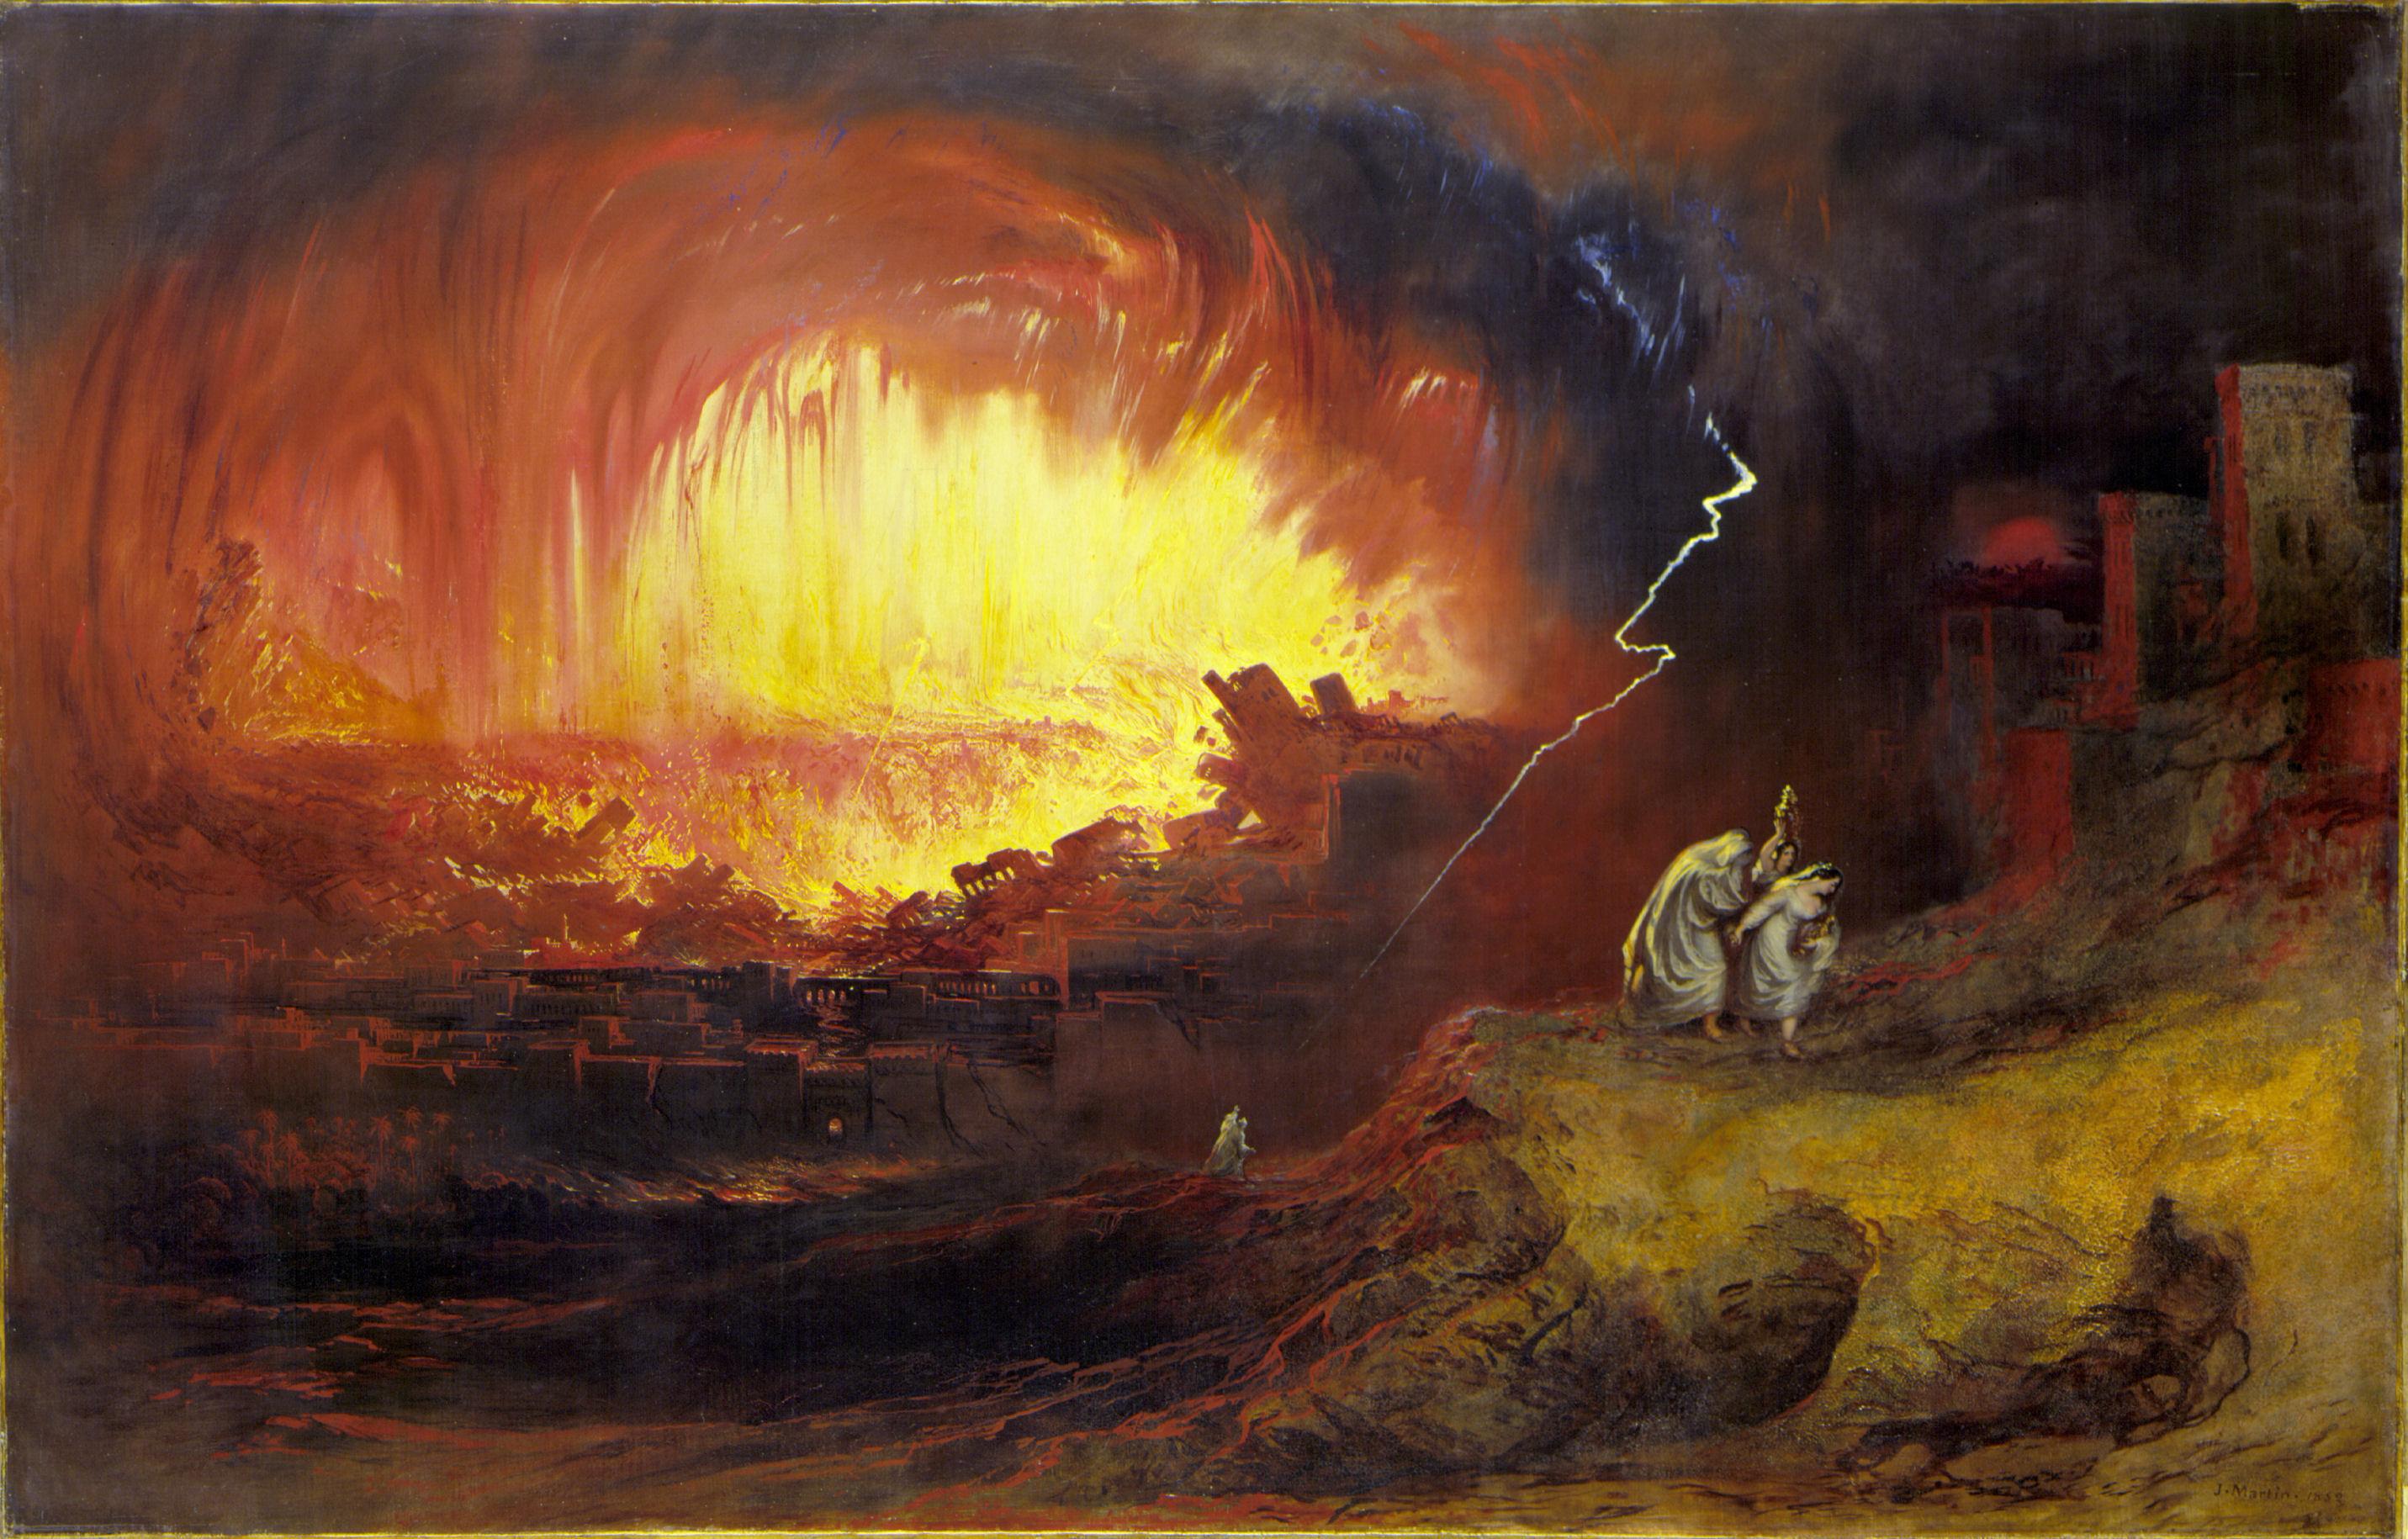 Sodom and Gomorrah - Simple English Wikipedia, the free encyclopedia